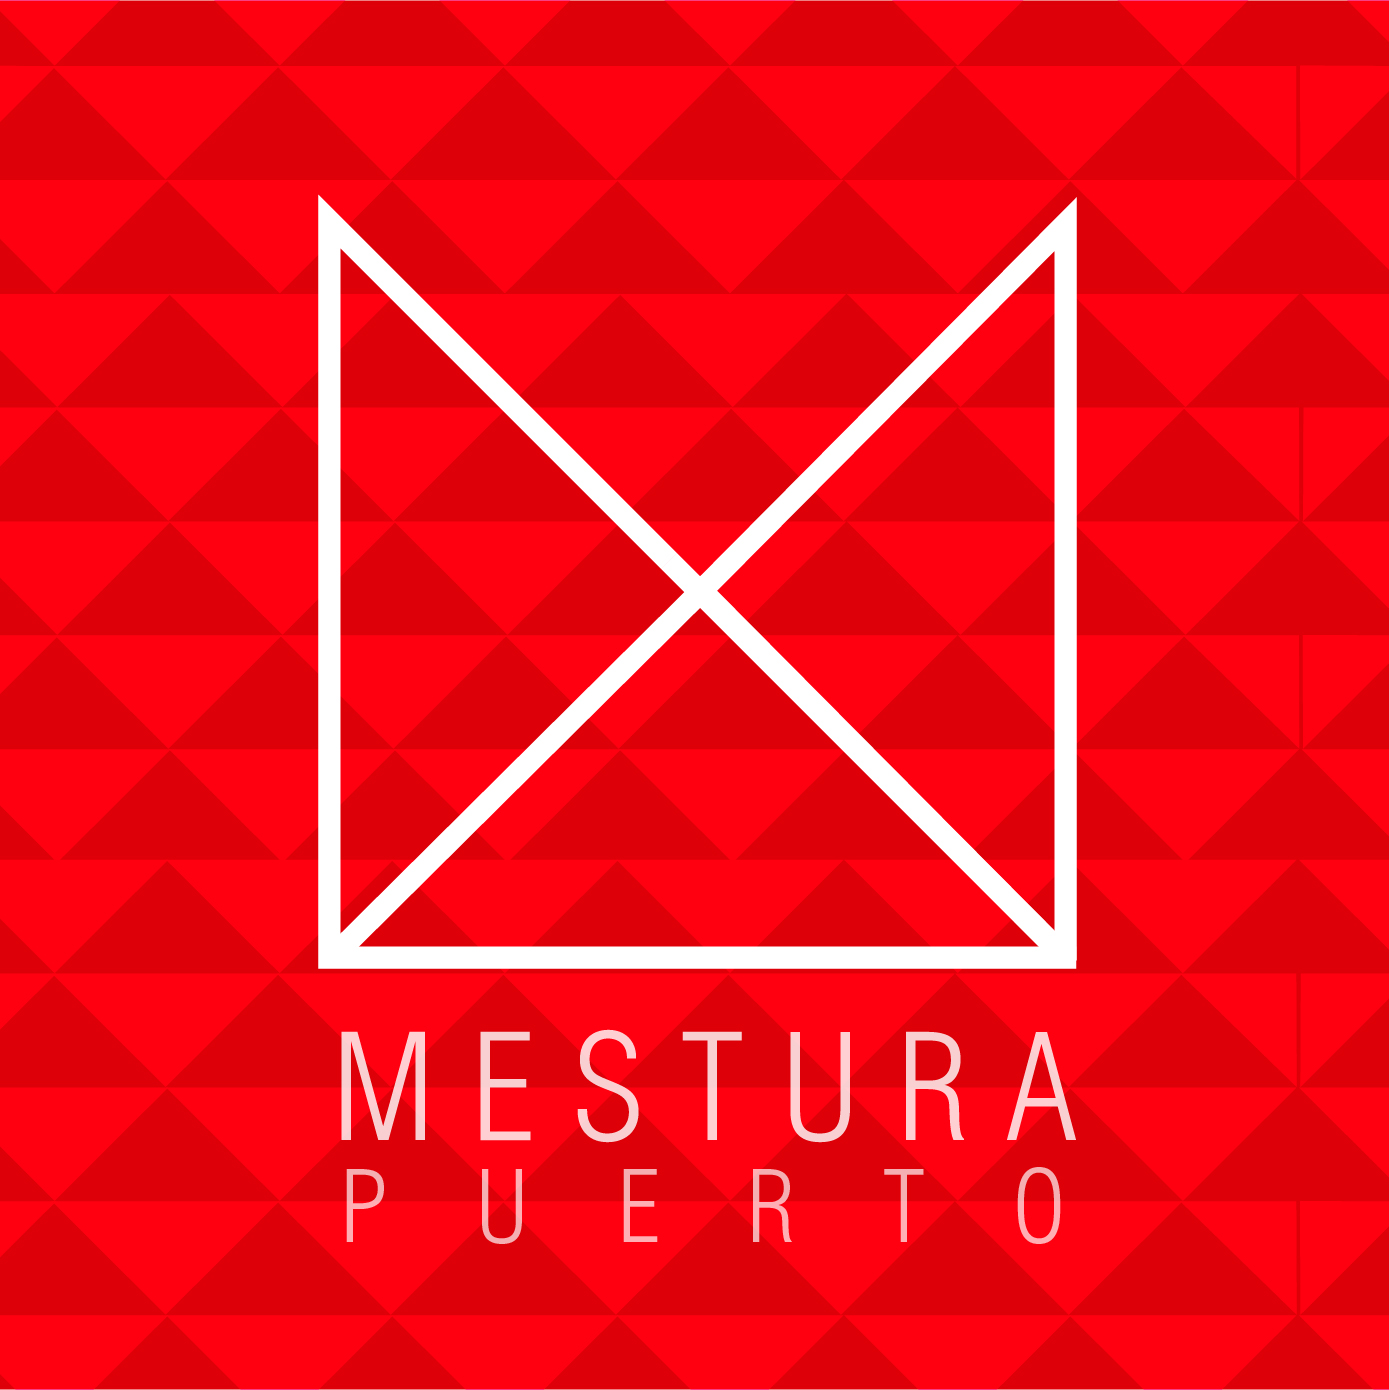 logotipo-familias/172108_Mestura-12.jpg